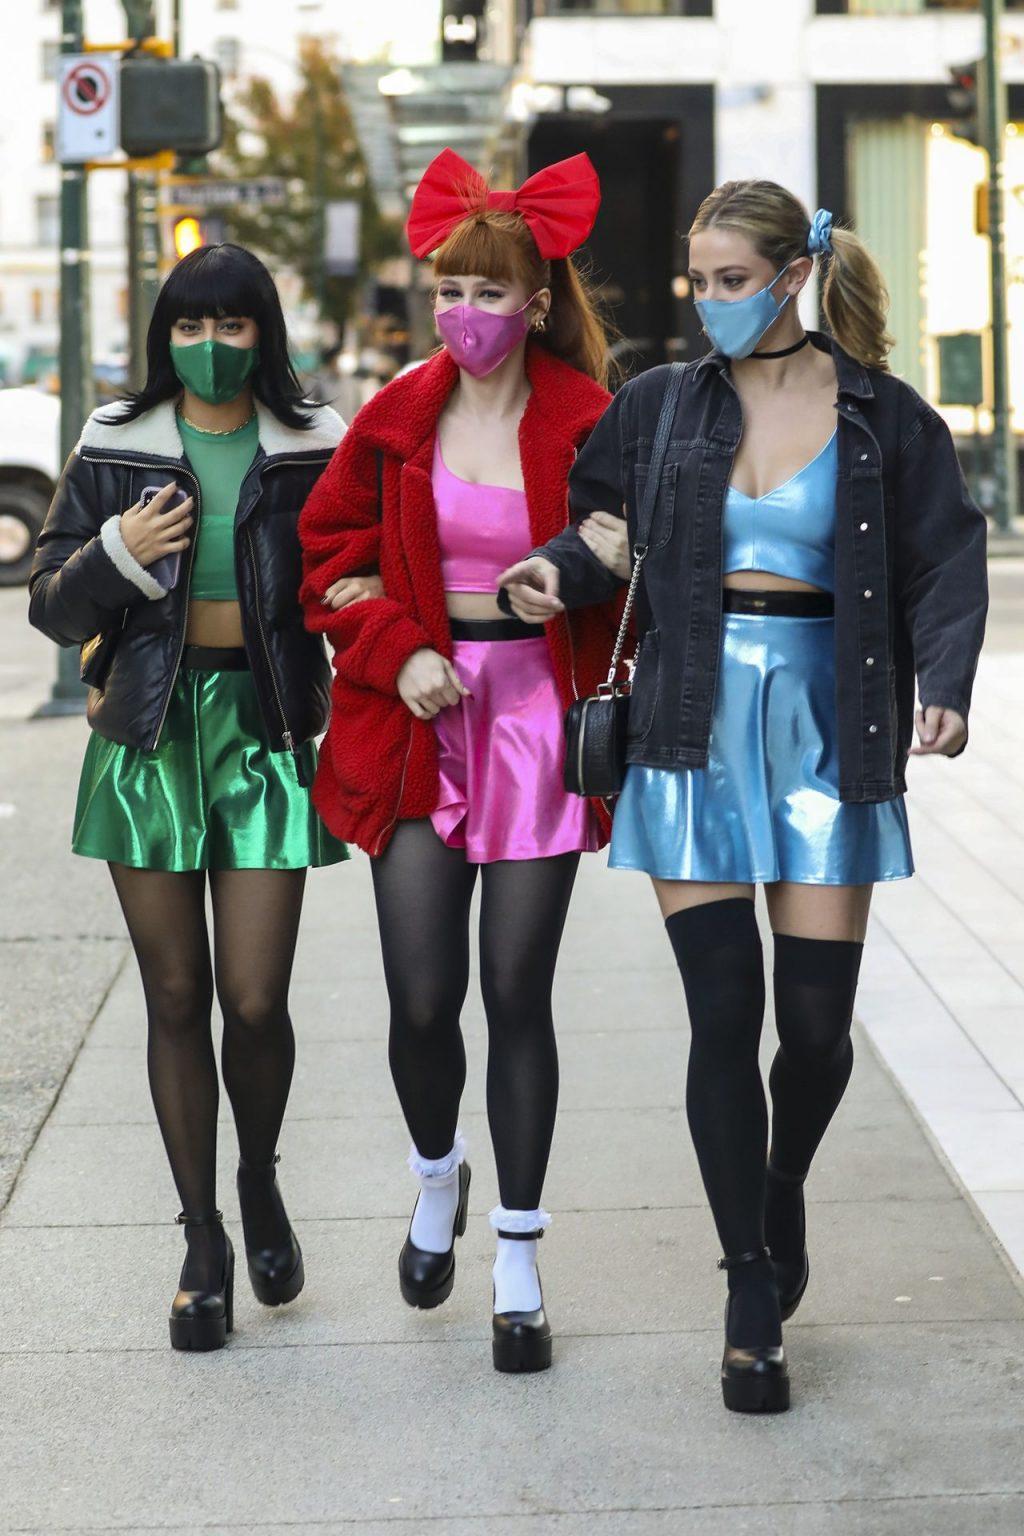 madelaine-petsch, lili-reinhart, camila-mendes